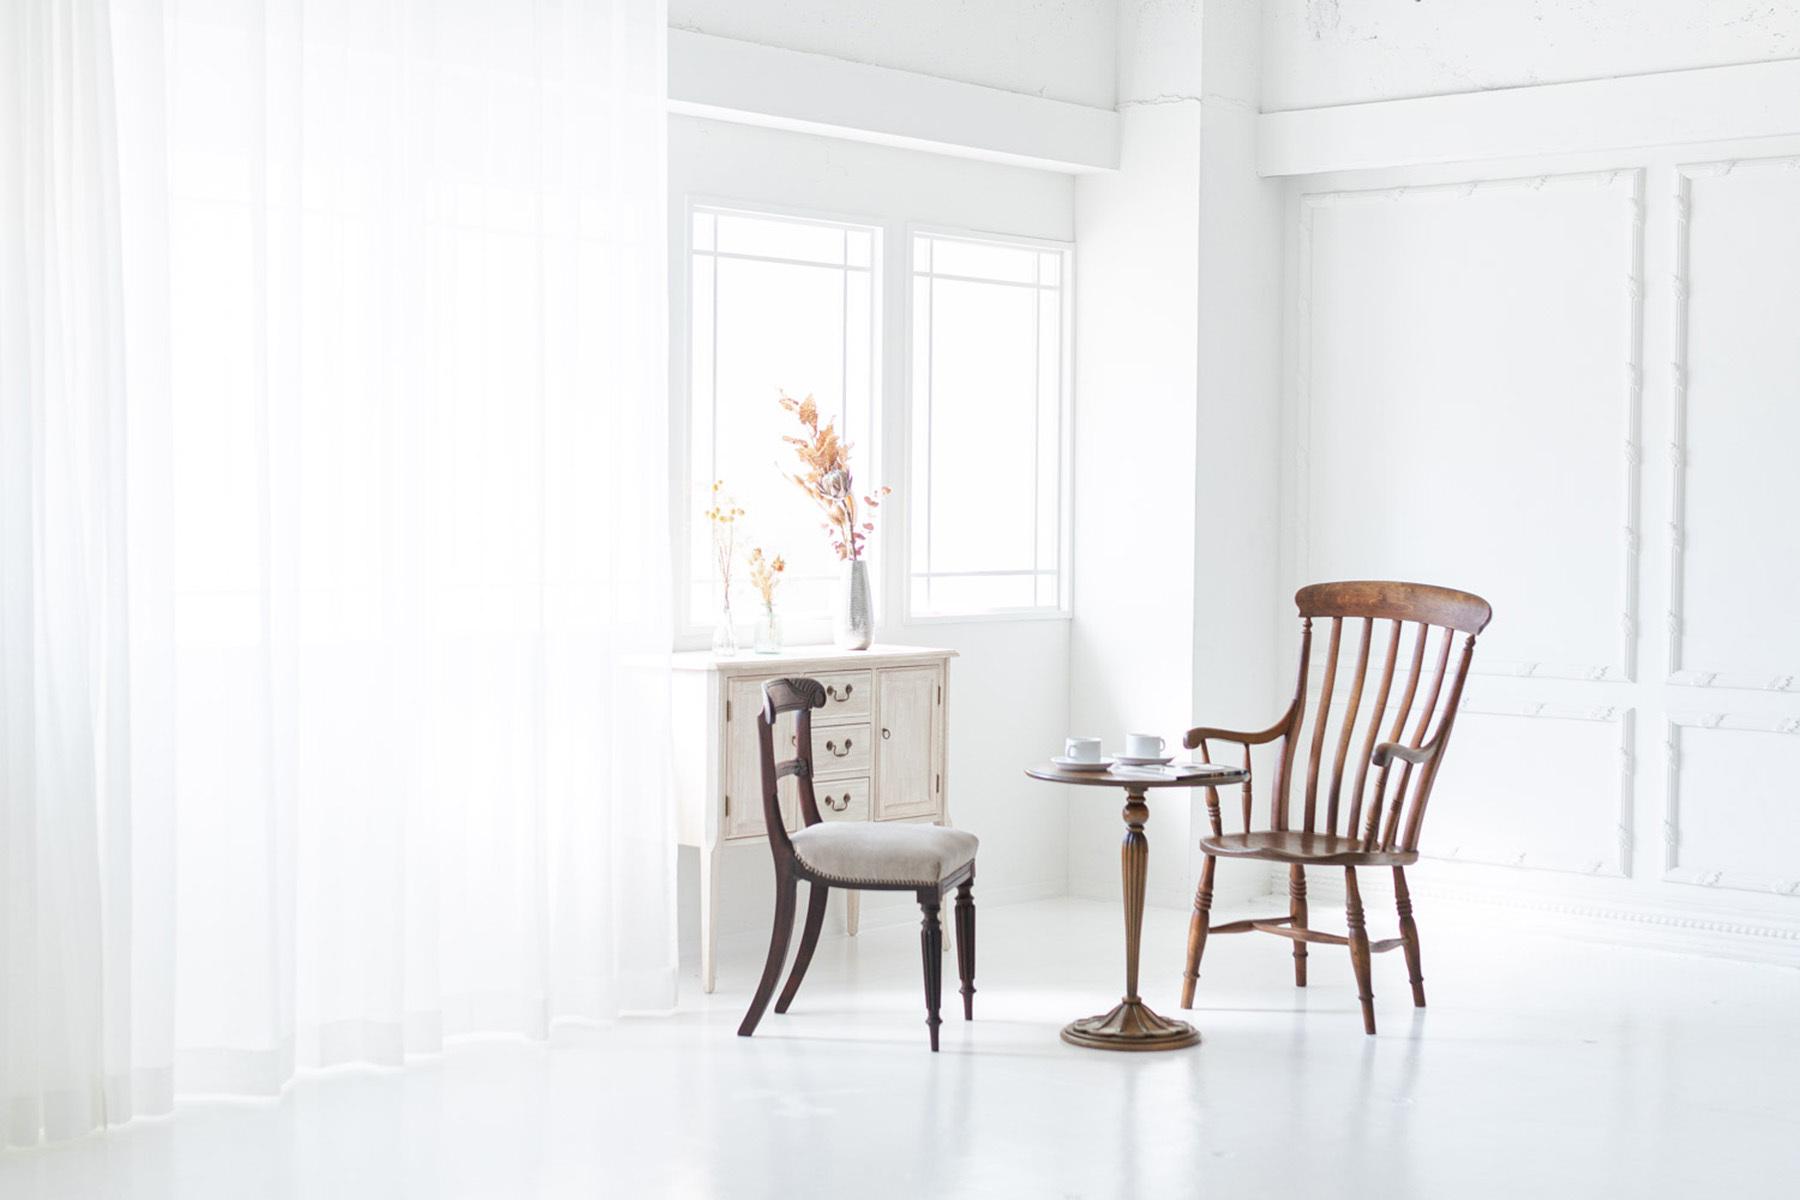 STUDIO FOXTAIL Ast (スタジオ フォックステイル Ast)自然光はもちろん窓裏照明も可能